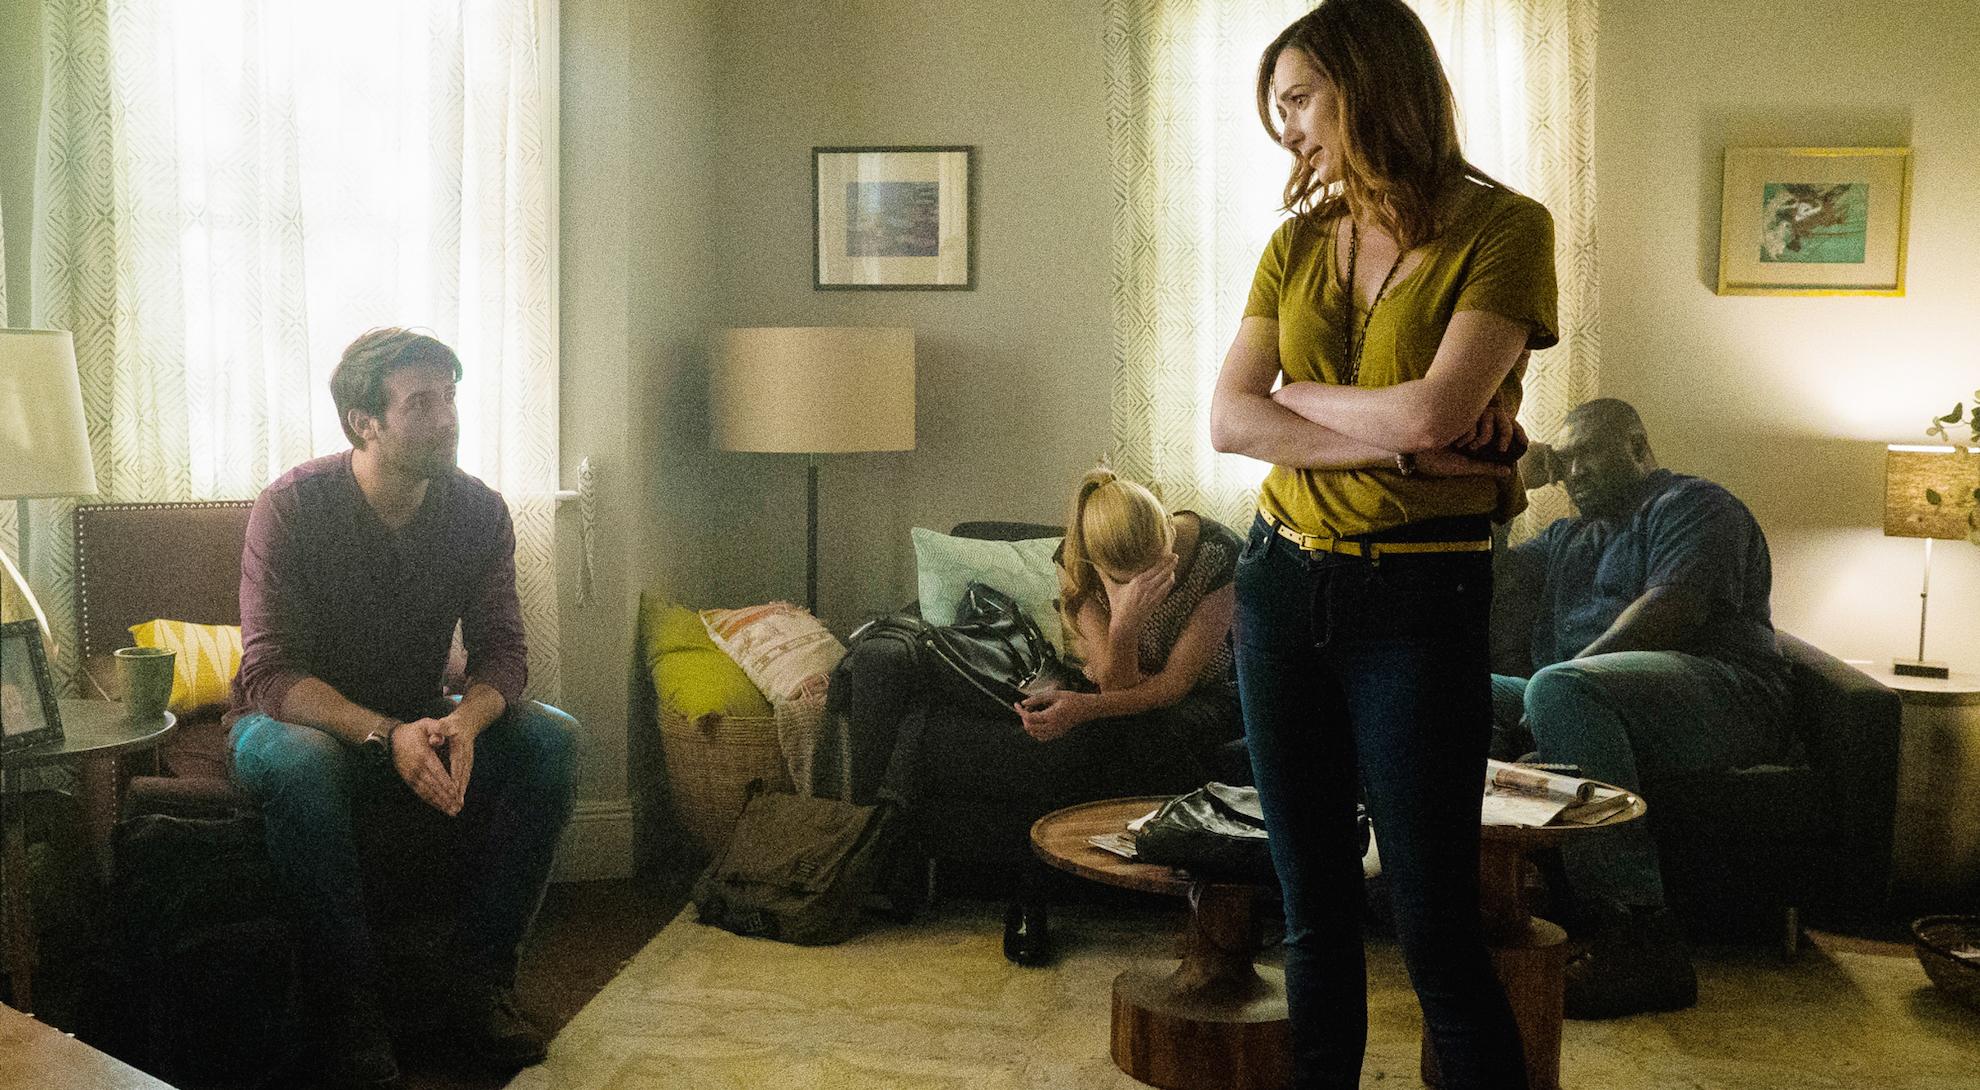 James Wolk as Jackson Oz, Nora Arnezeder as Chloe Tousignant, Kristen Connolly as Jamie Campbell, and Nonso Anozie as Abraham Kenyatta.